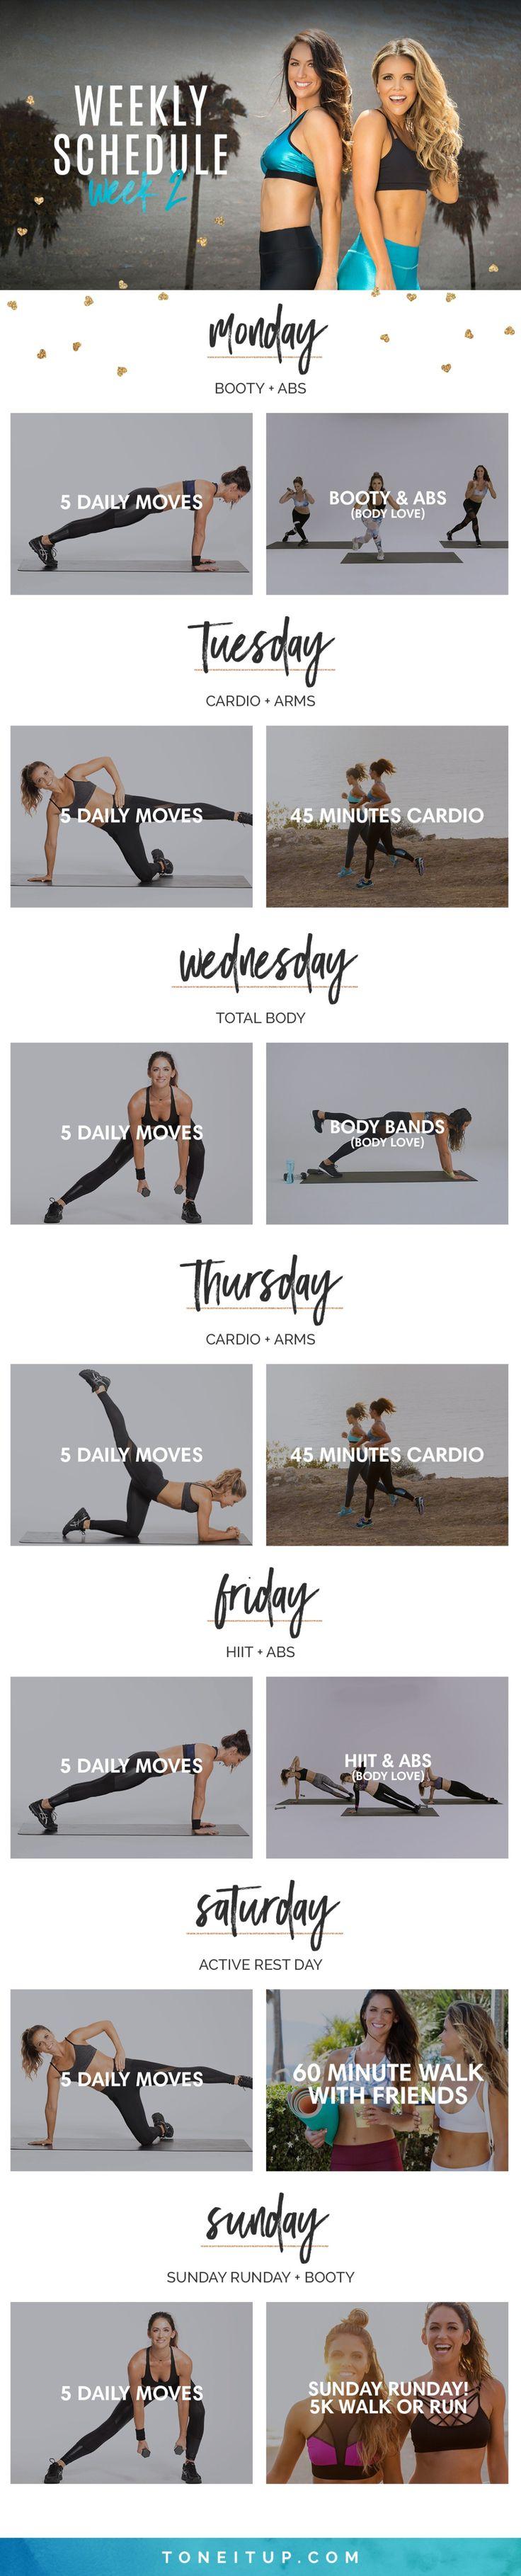 Tone It Up Challenge Week 2 Weekly Schedule